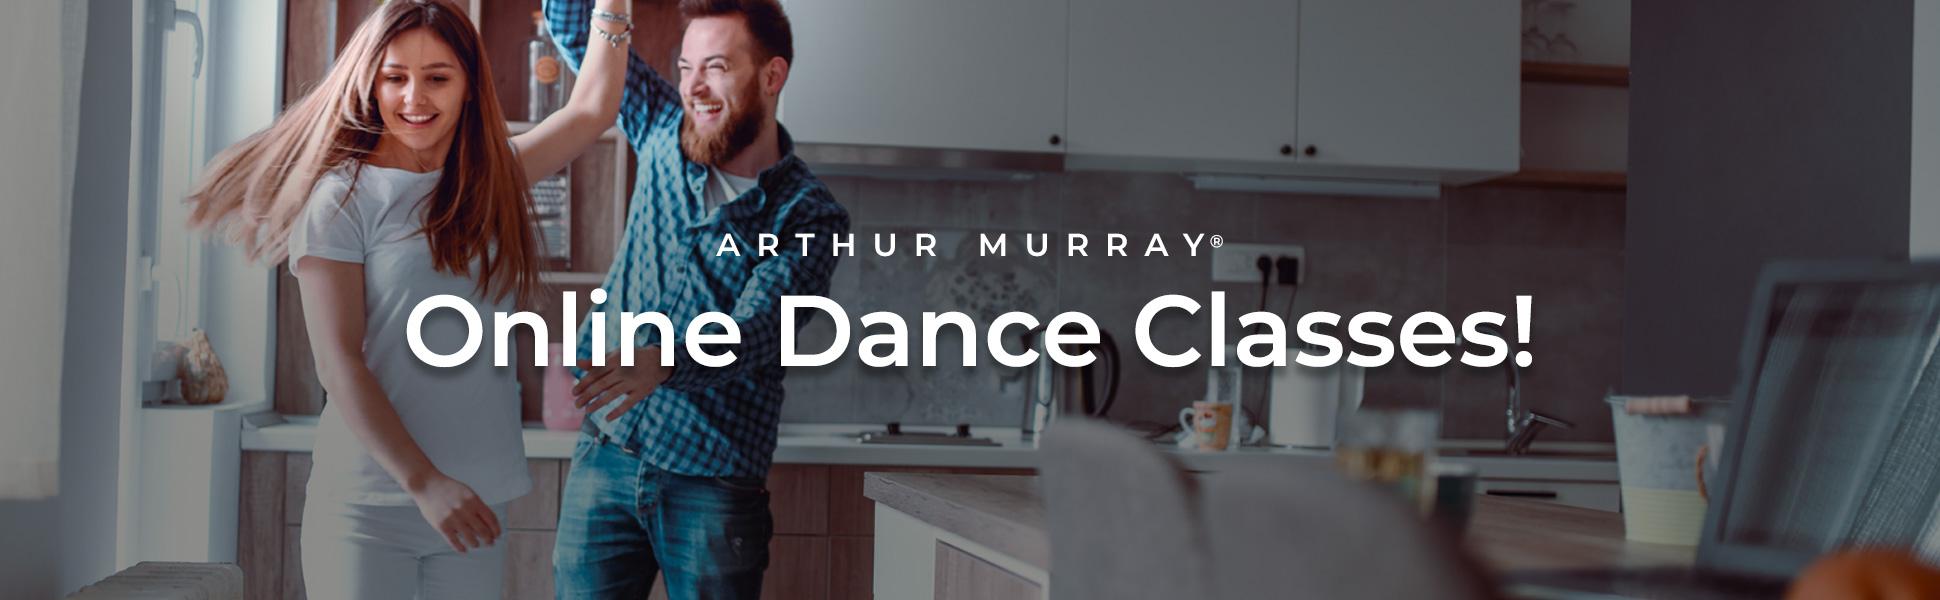 Arthur Murray Online Dance Classes